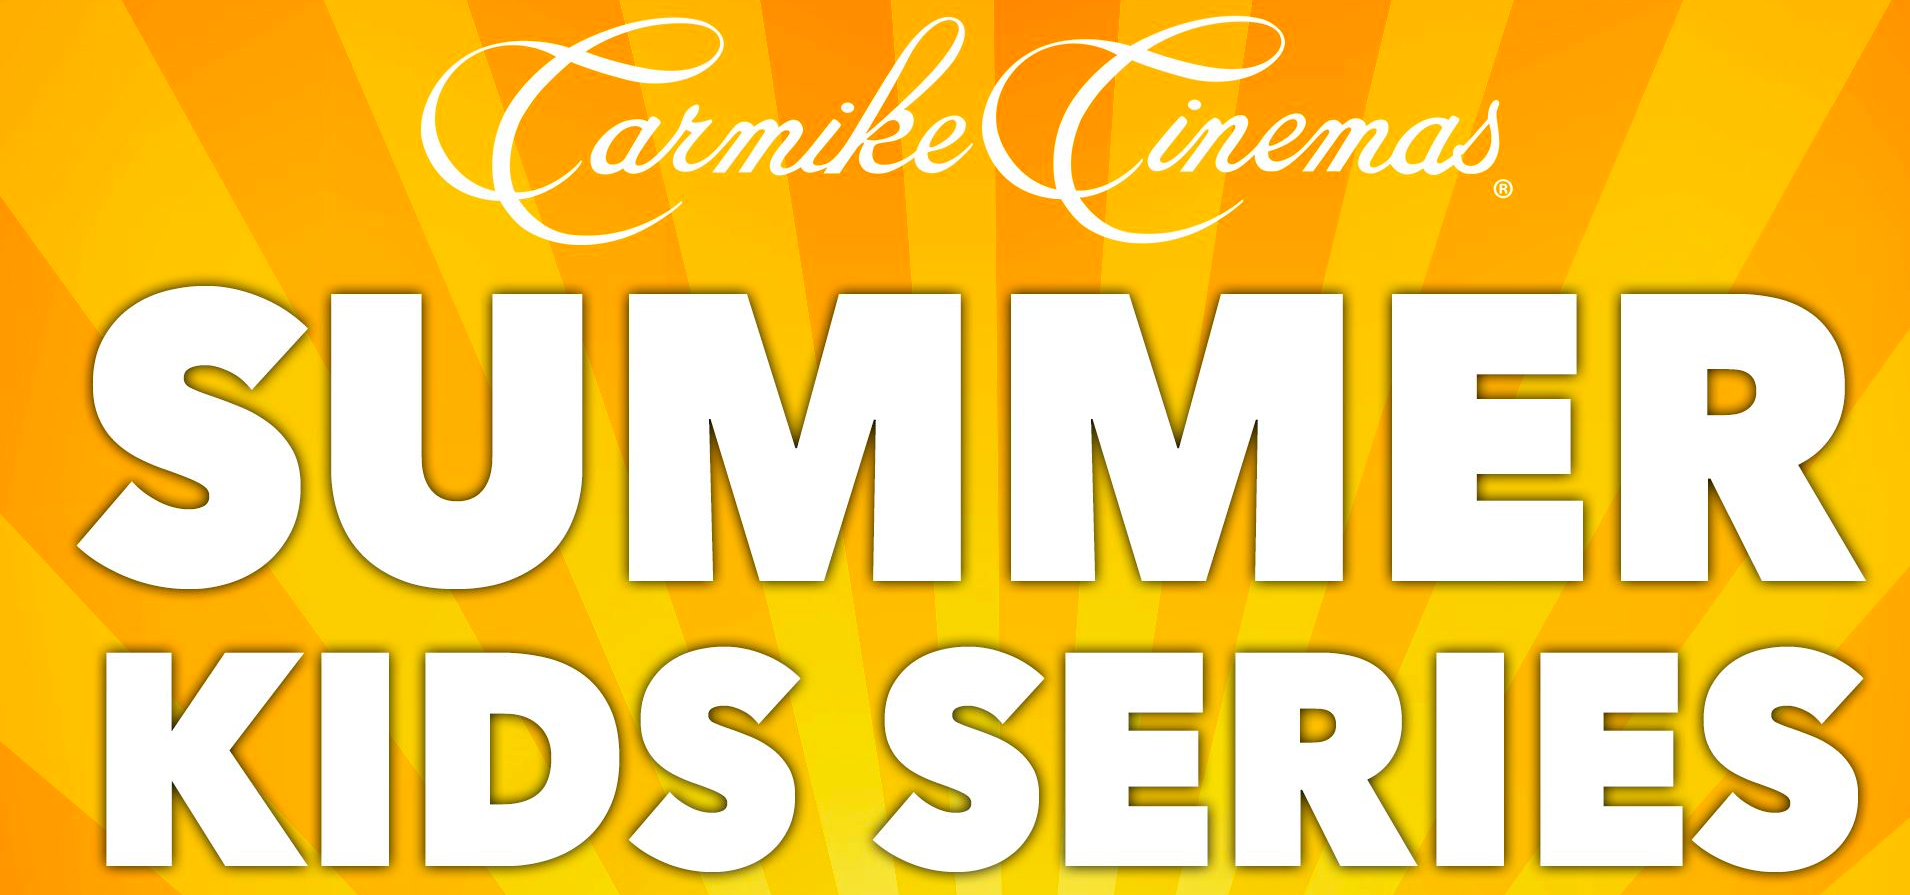 Carmike Banner